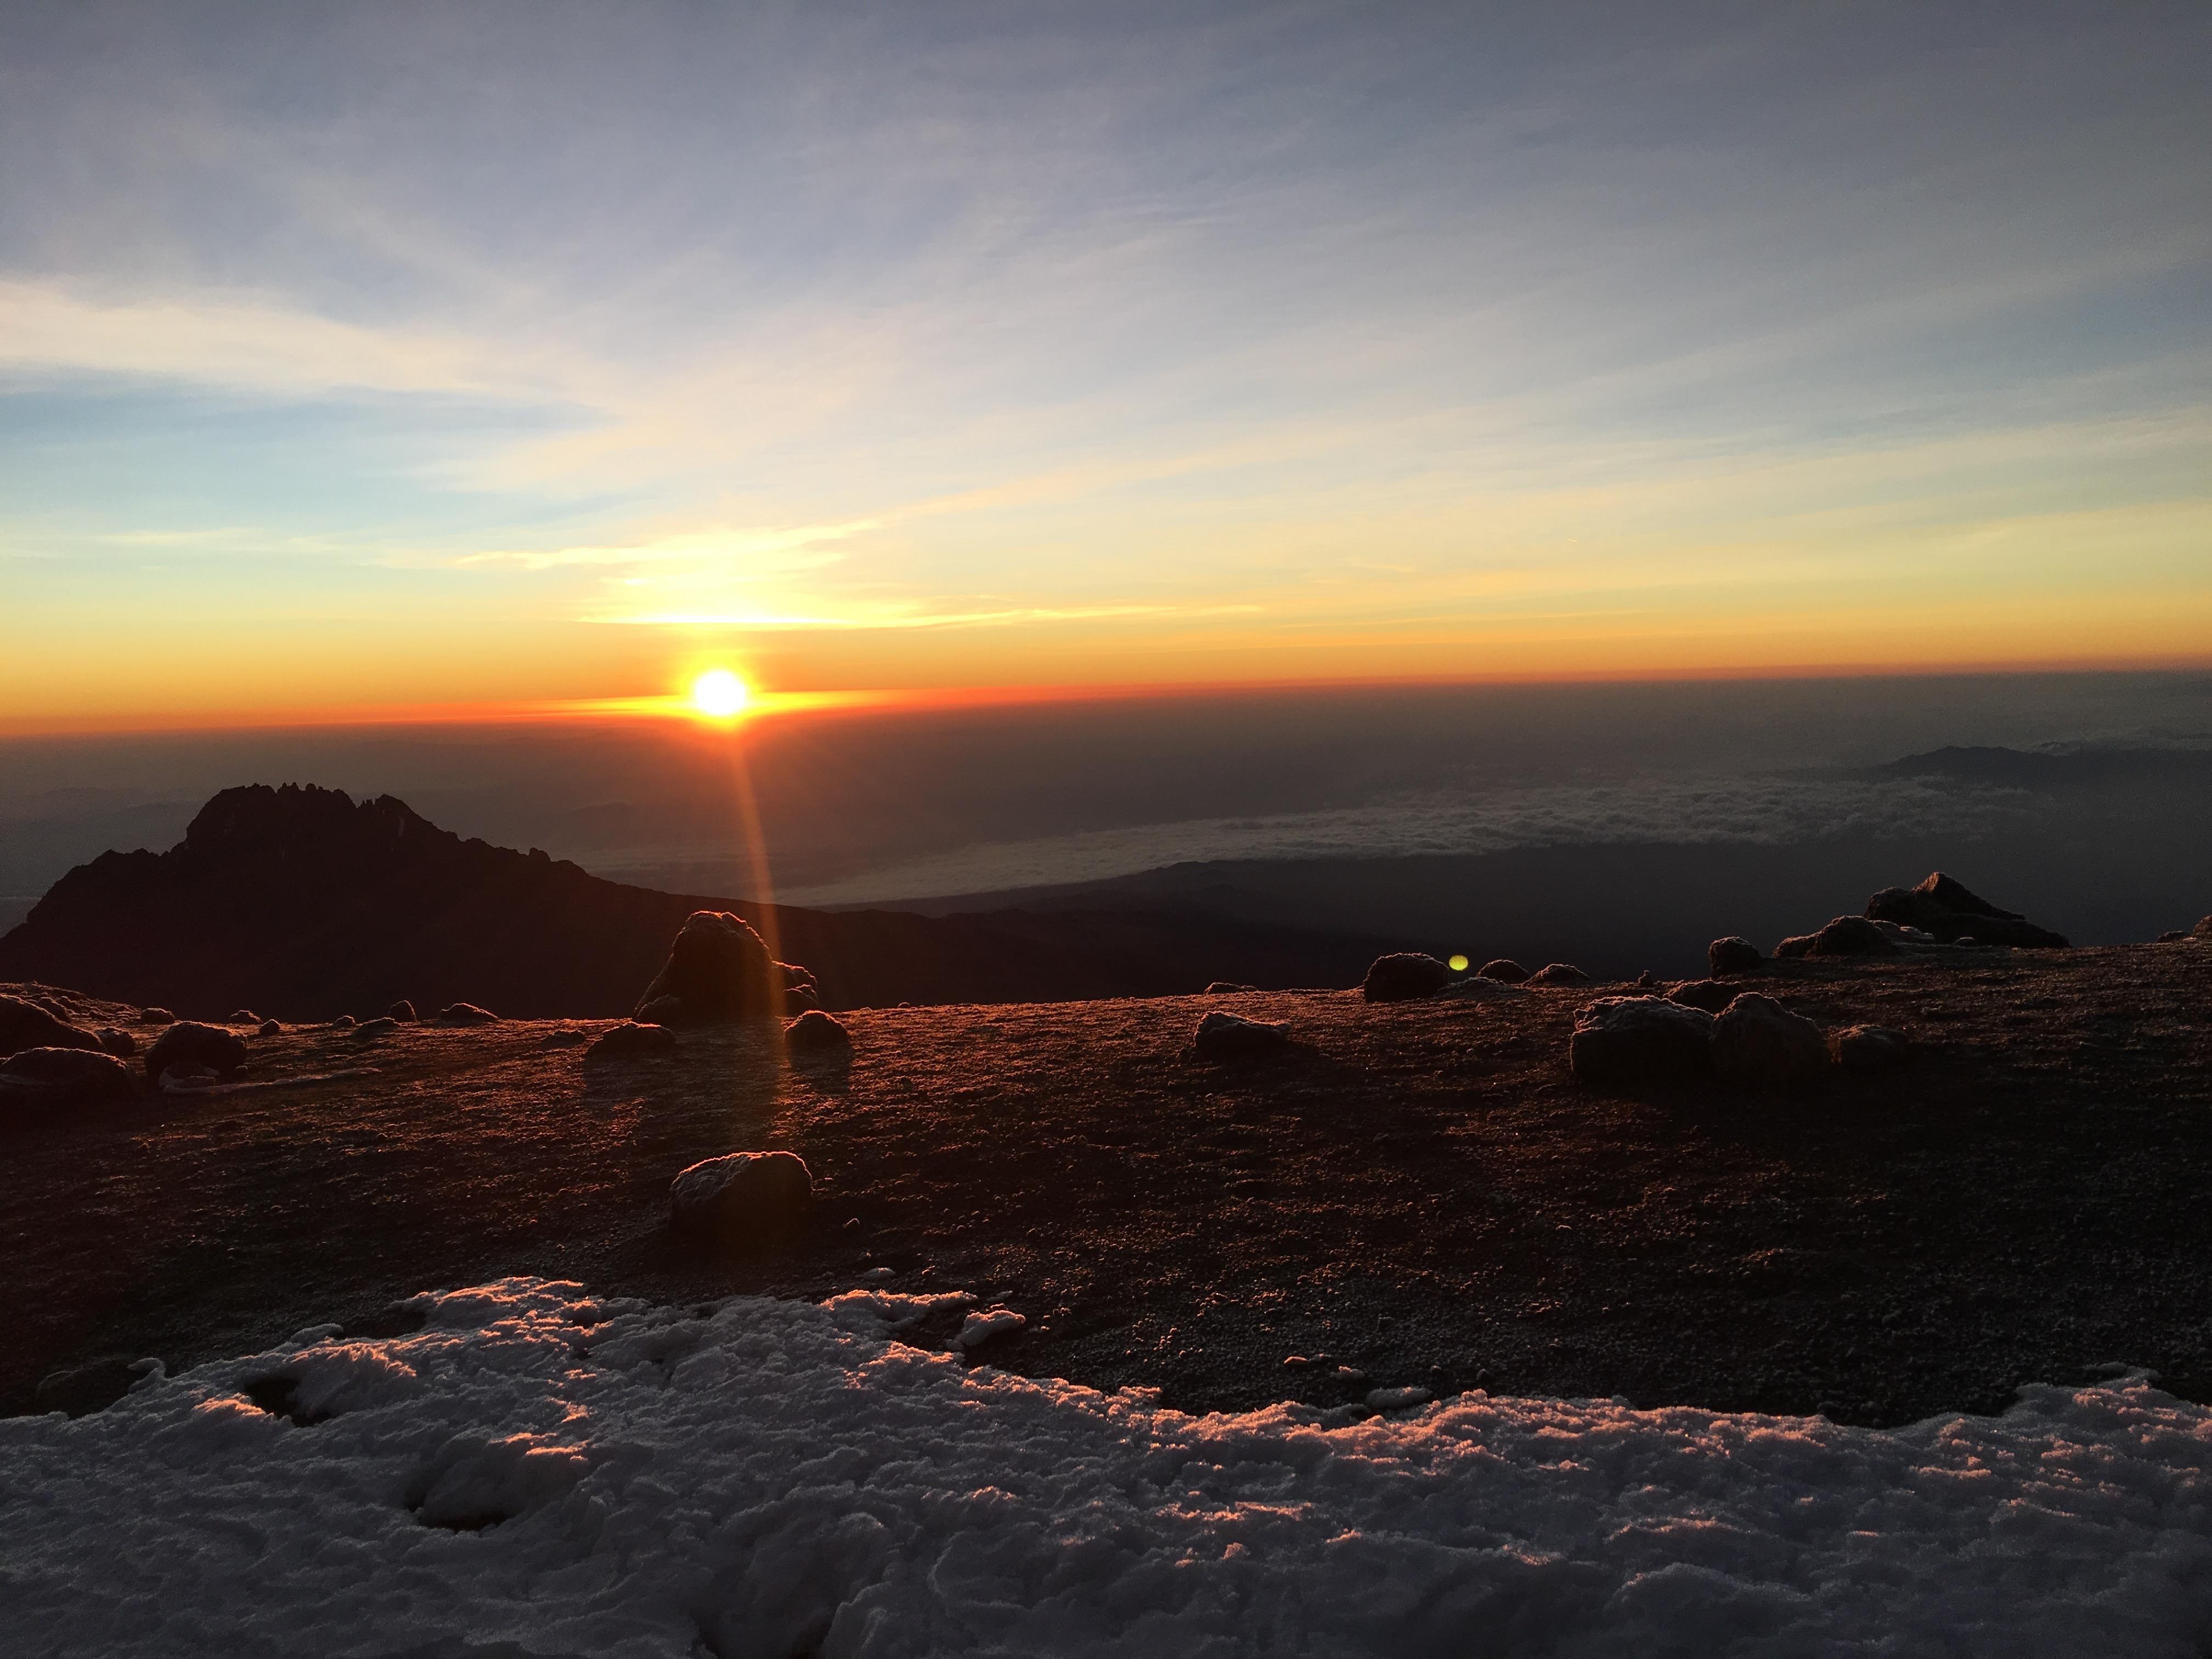 Climb 2 Cure Kilimanjaro